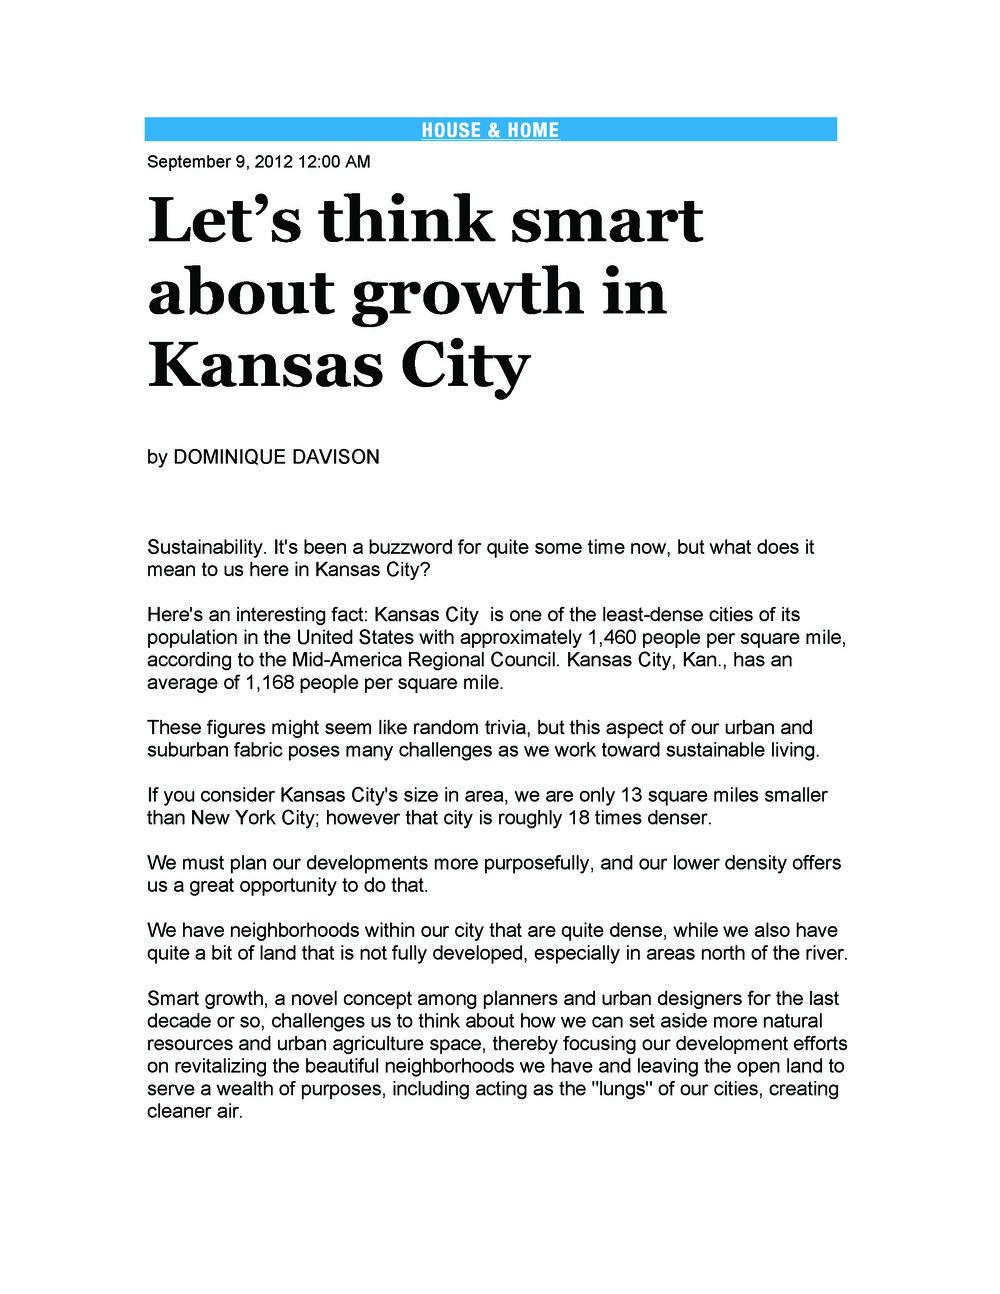 KCStar_2012_SmartGrowth_DominiqueDavison_Page_1.jpg